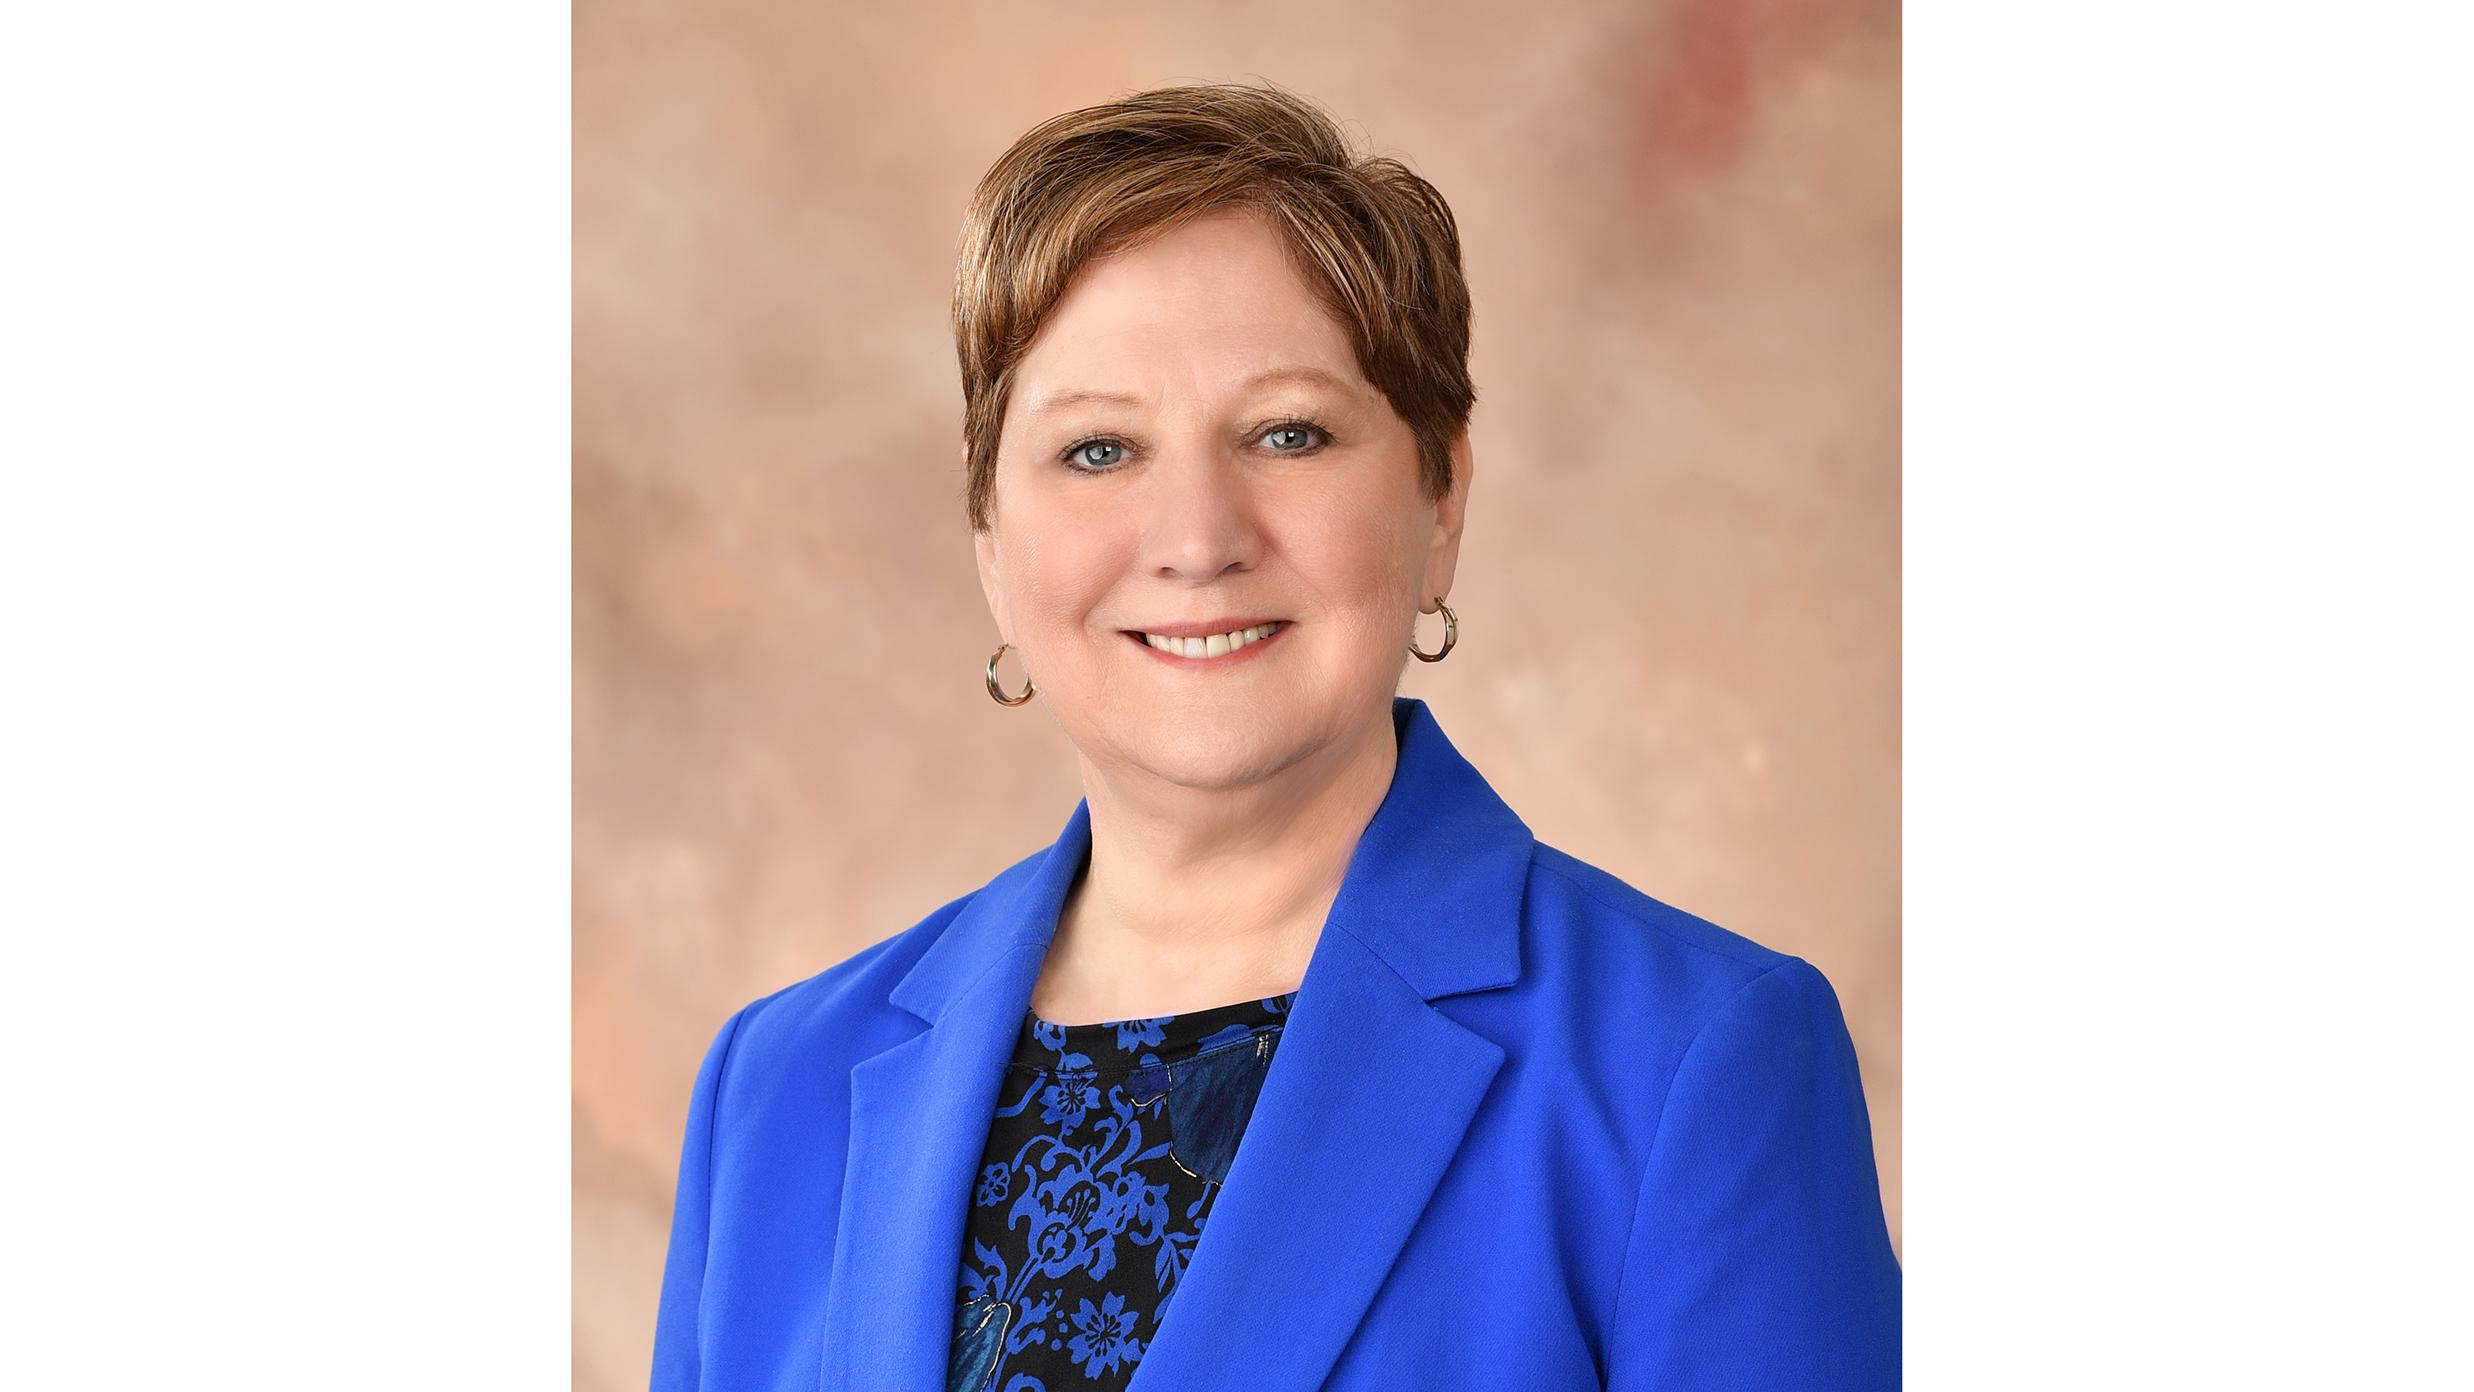 Riverside Announces Kathy O Grady As Vice President Of Clinical Services Kankakee Bourbonnais Illinois Il Riverside Healthcare